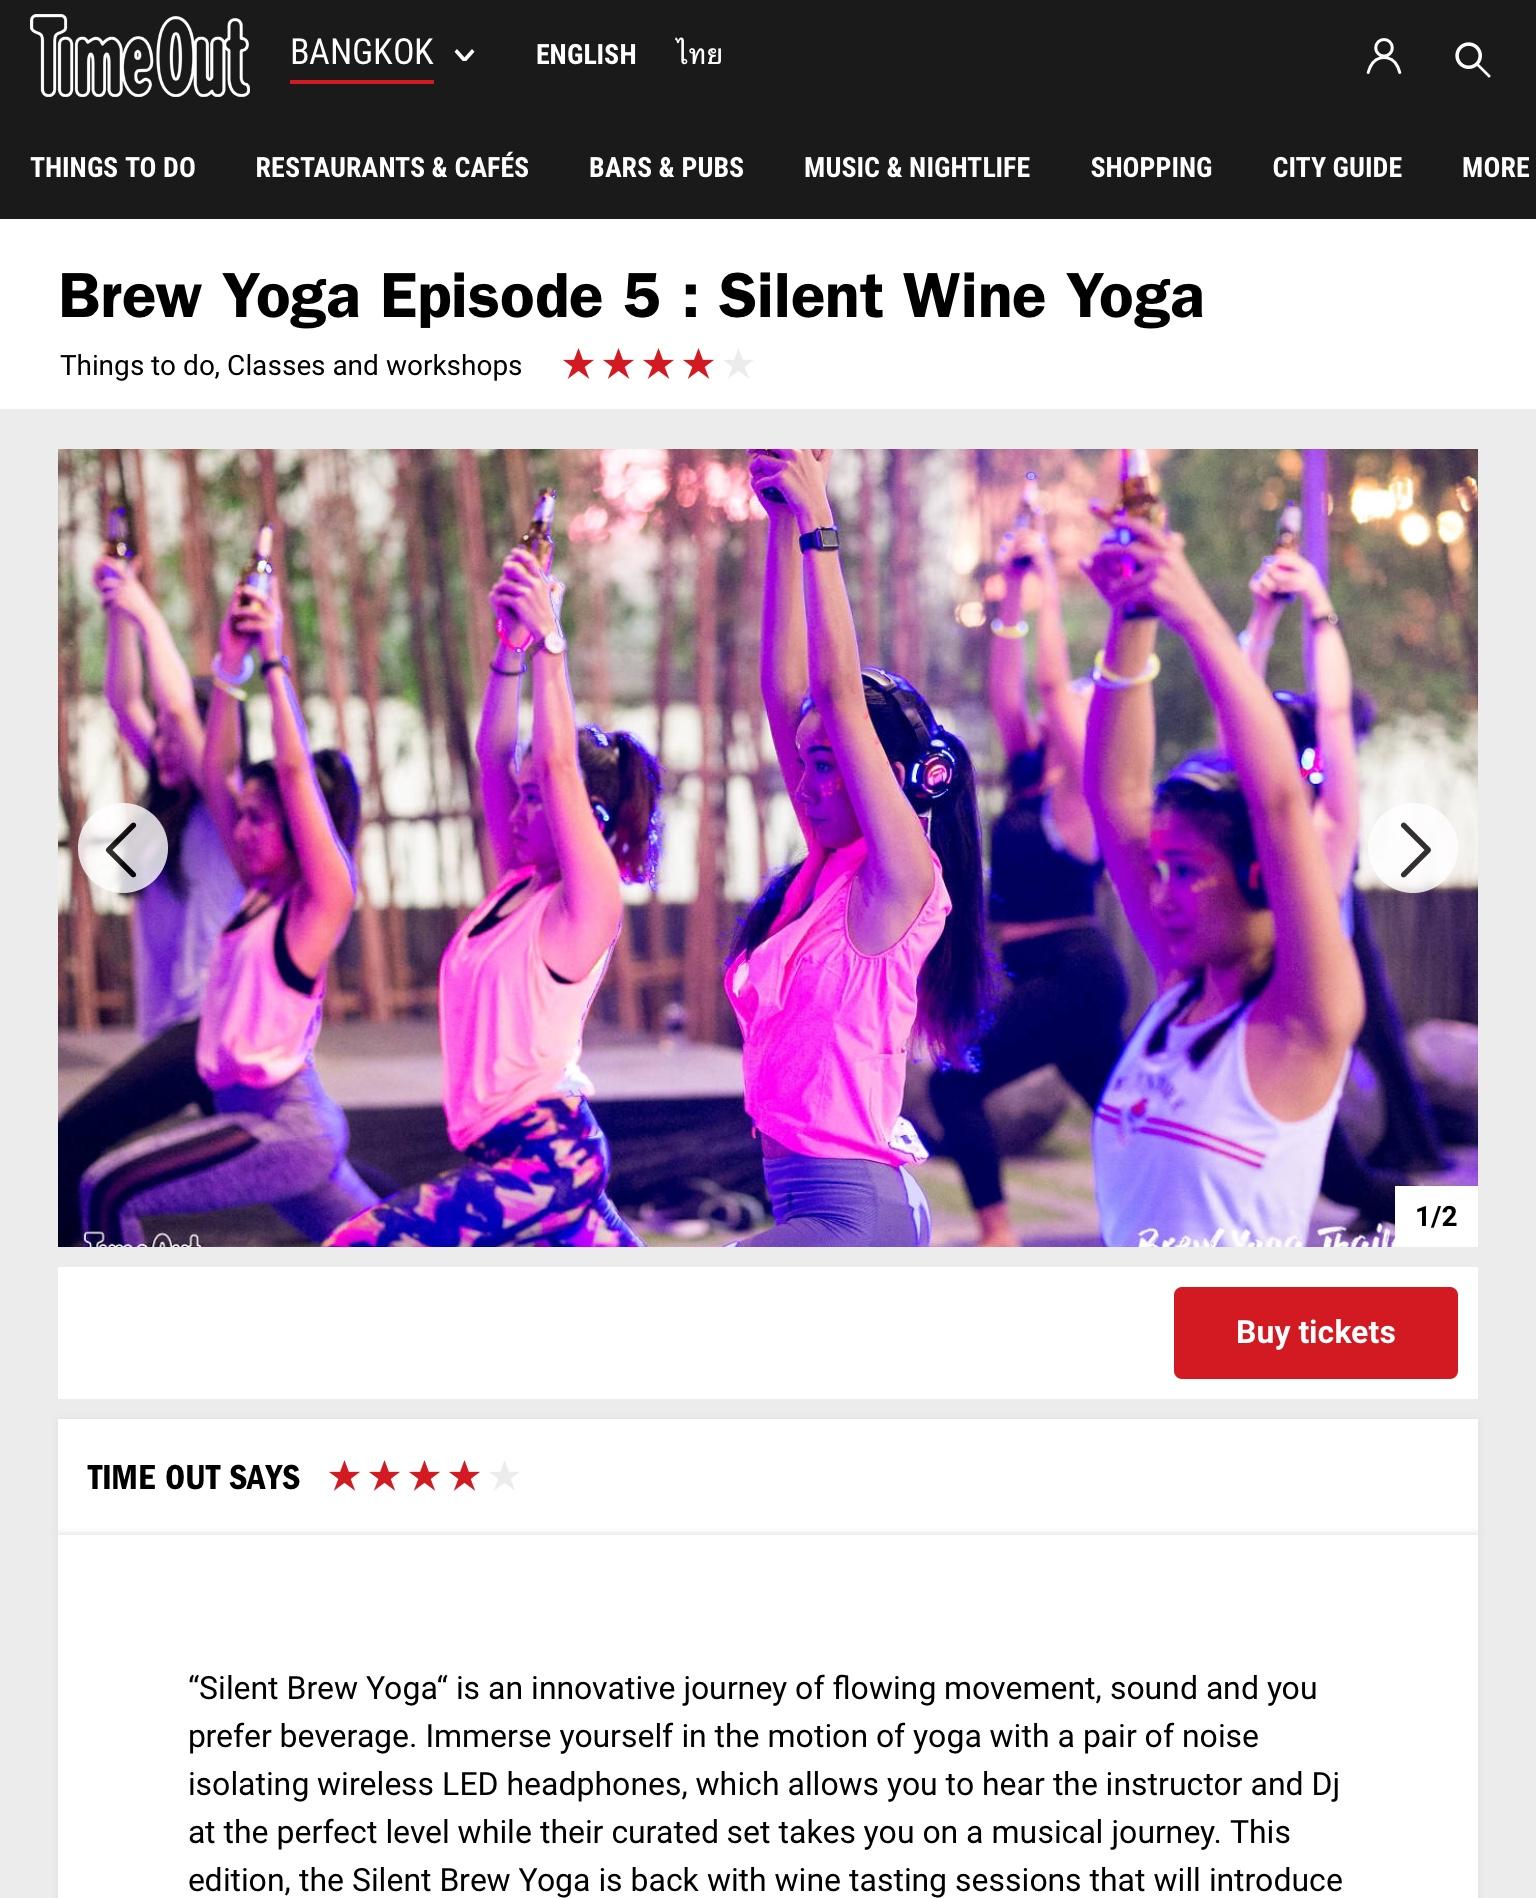 Brew Yoga Episode 5 : Silent Wine Yoga